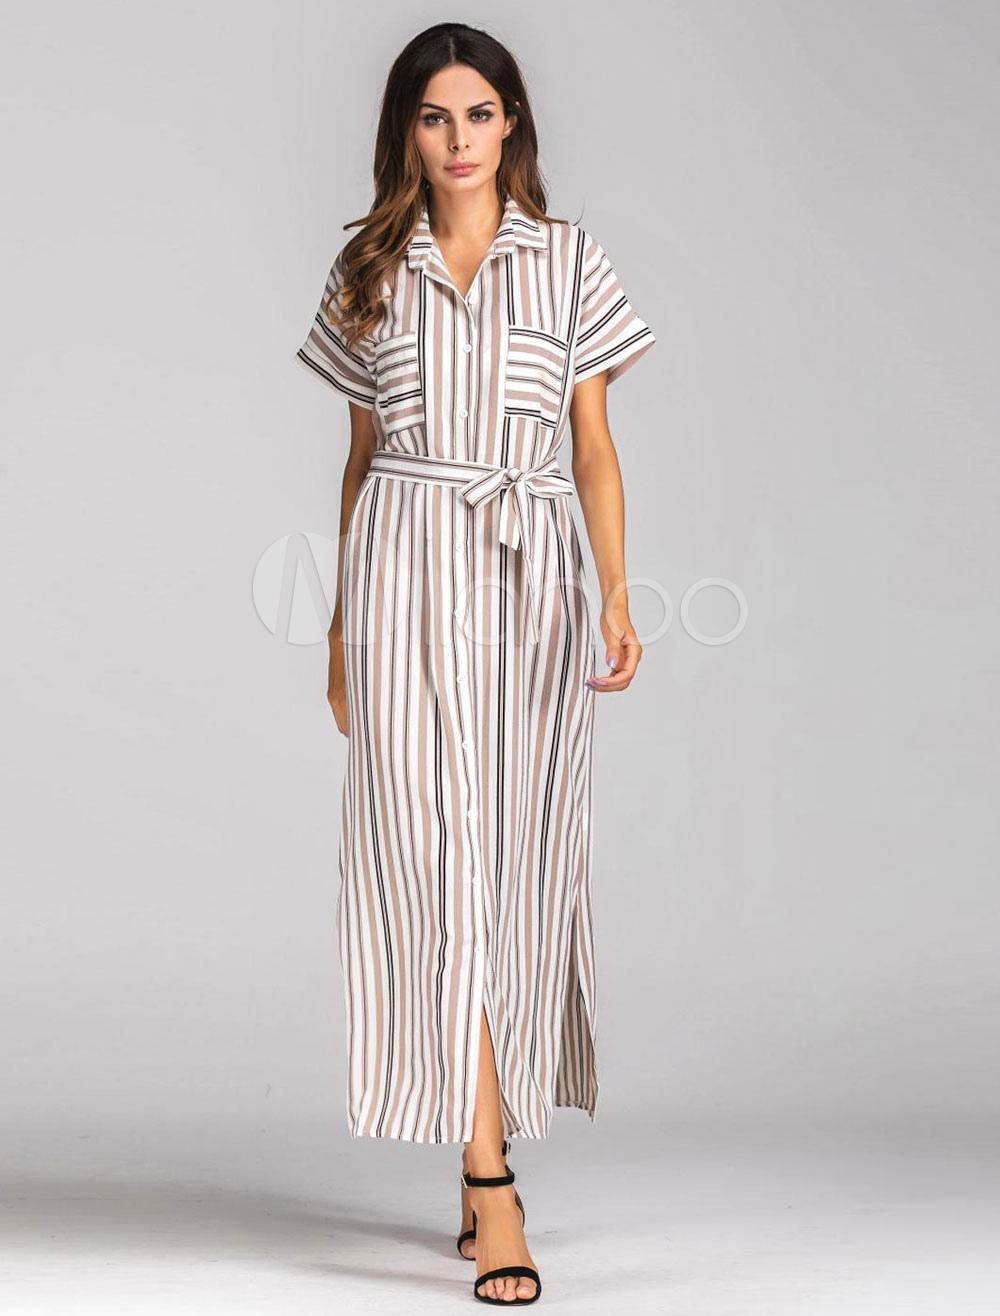 Apricot Shirt Dress Short Sleeve Turndown Collar Striped Women's Long Dresses (Women\\'s Clothing Shirt Dresses) photo